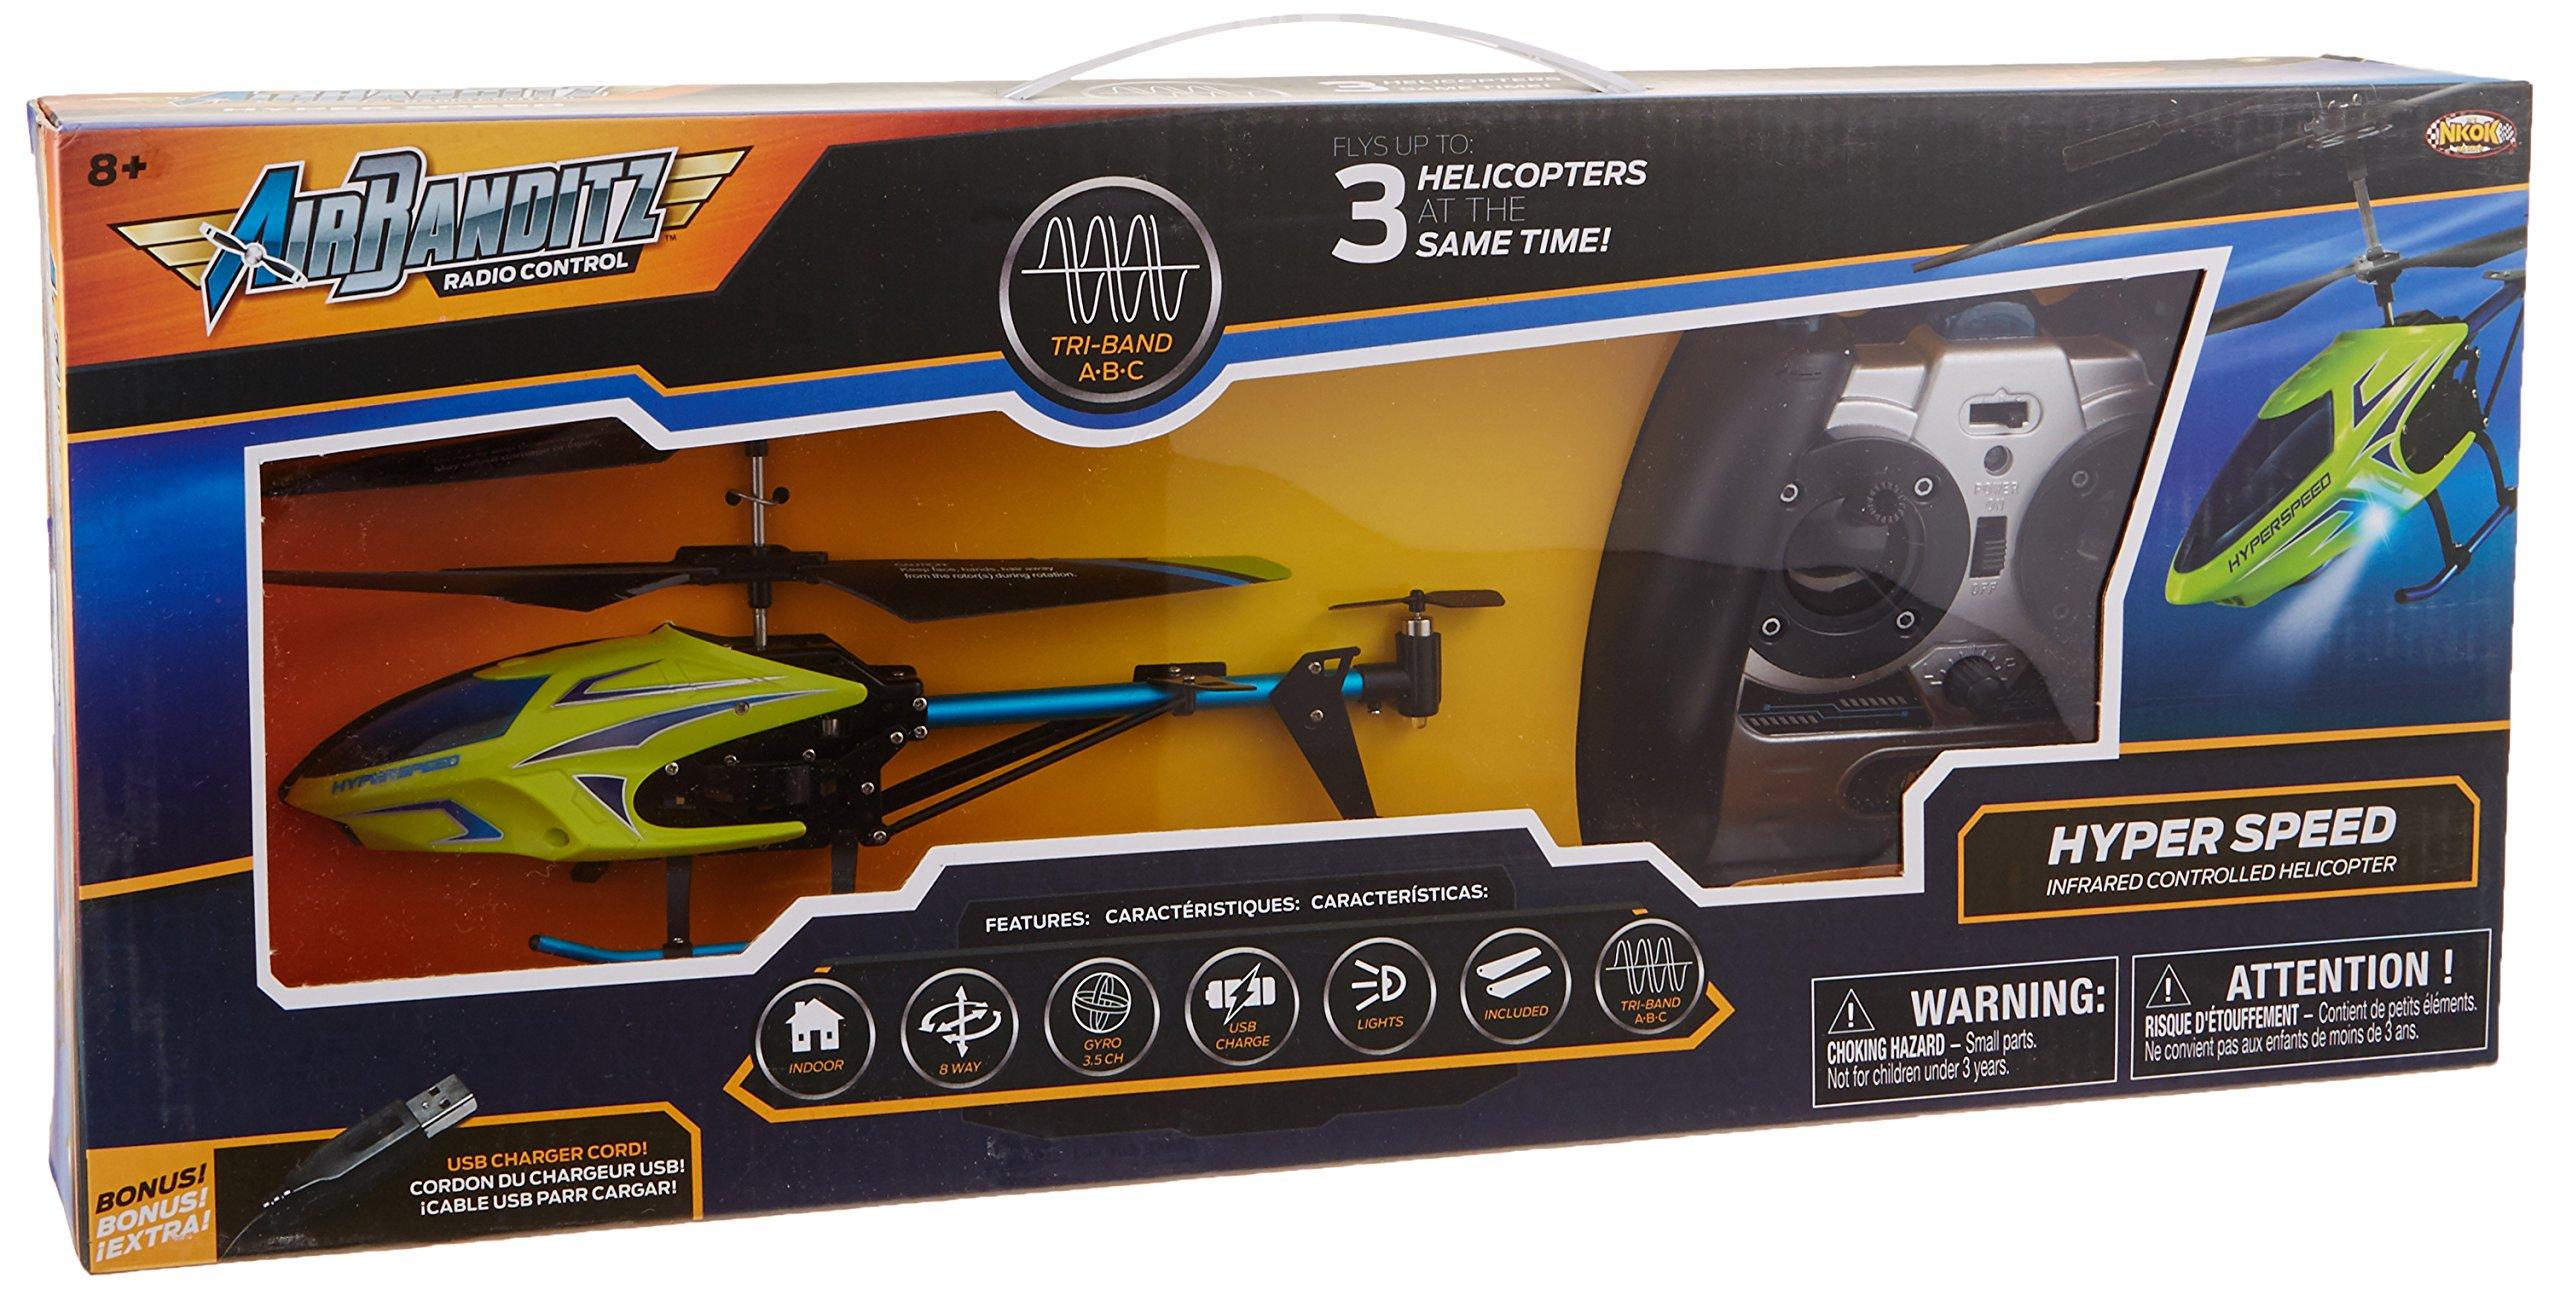 NKOK Air Banditz 3.5CH IR/USB Hyperspeed Remote Control Toy